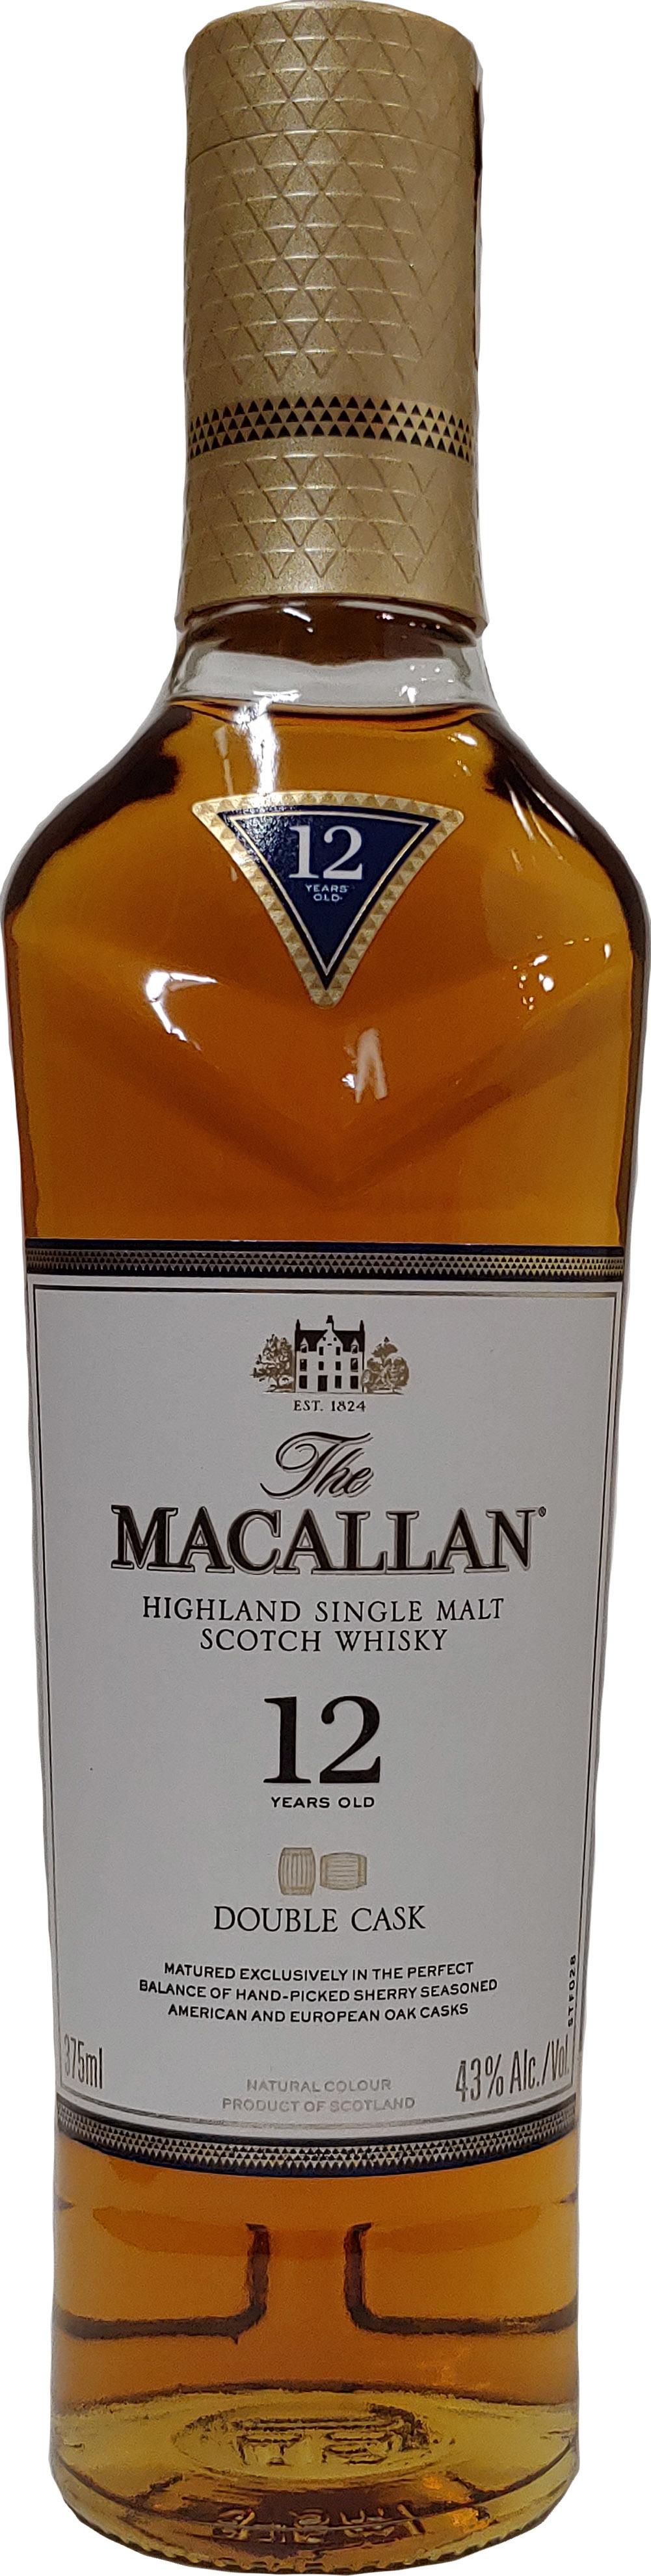 Macallan Double Cask Highland Single Malt Scotch Whisky 12 year old